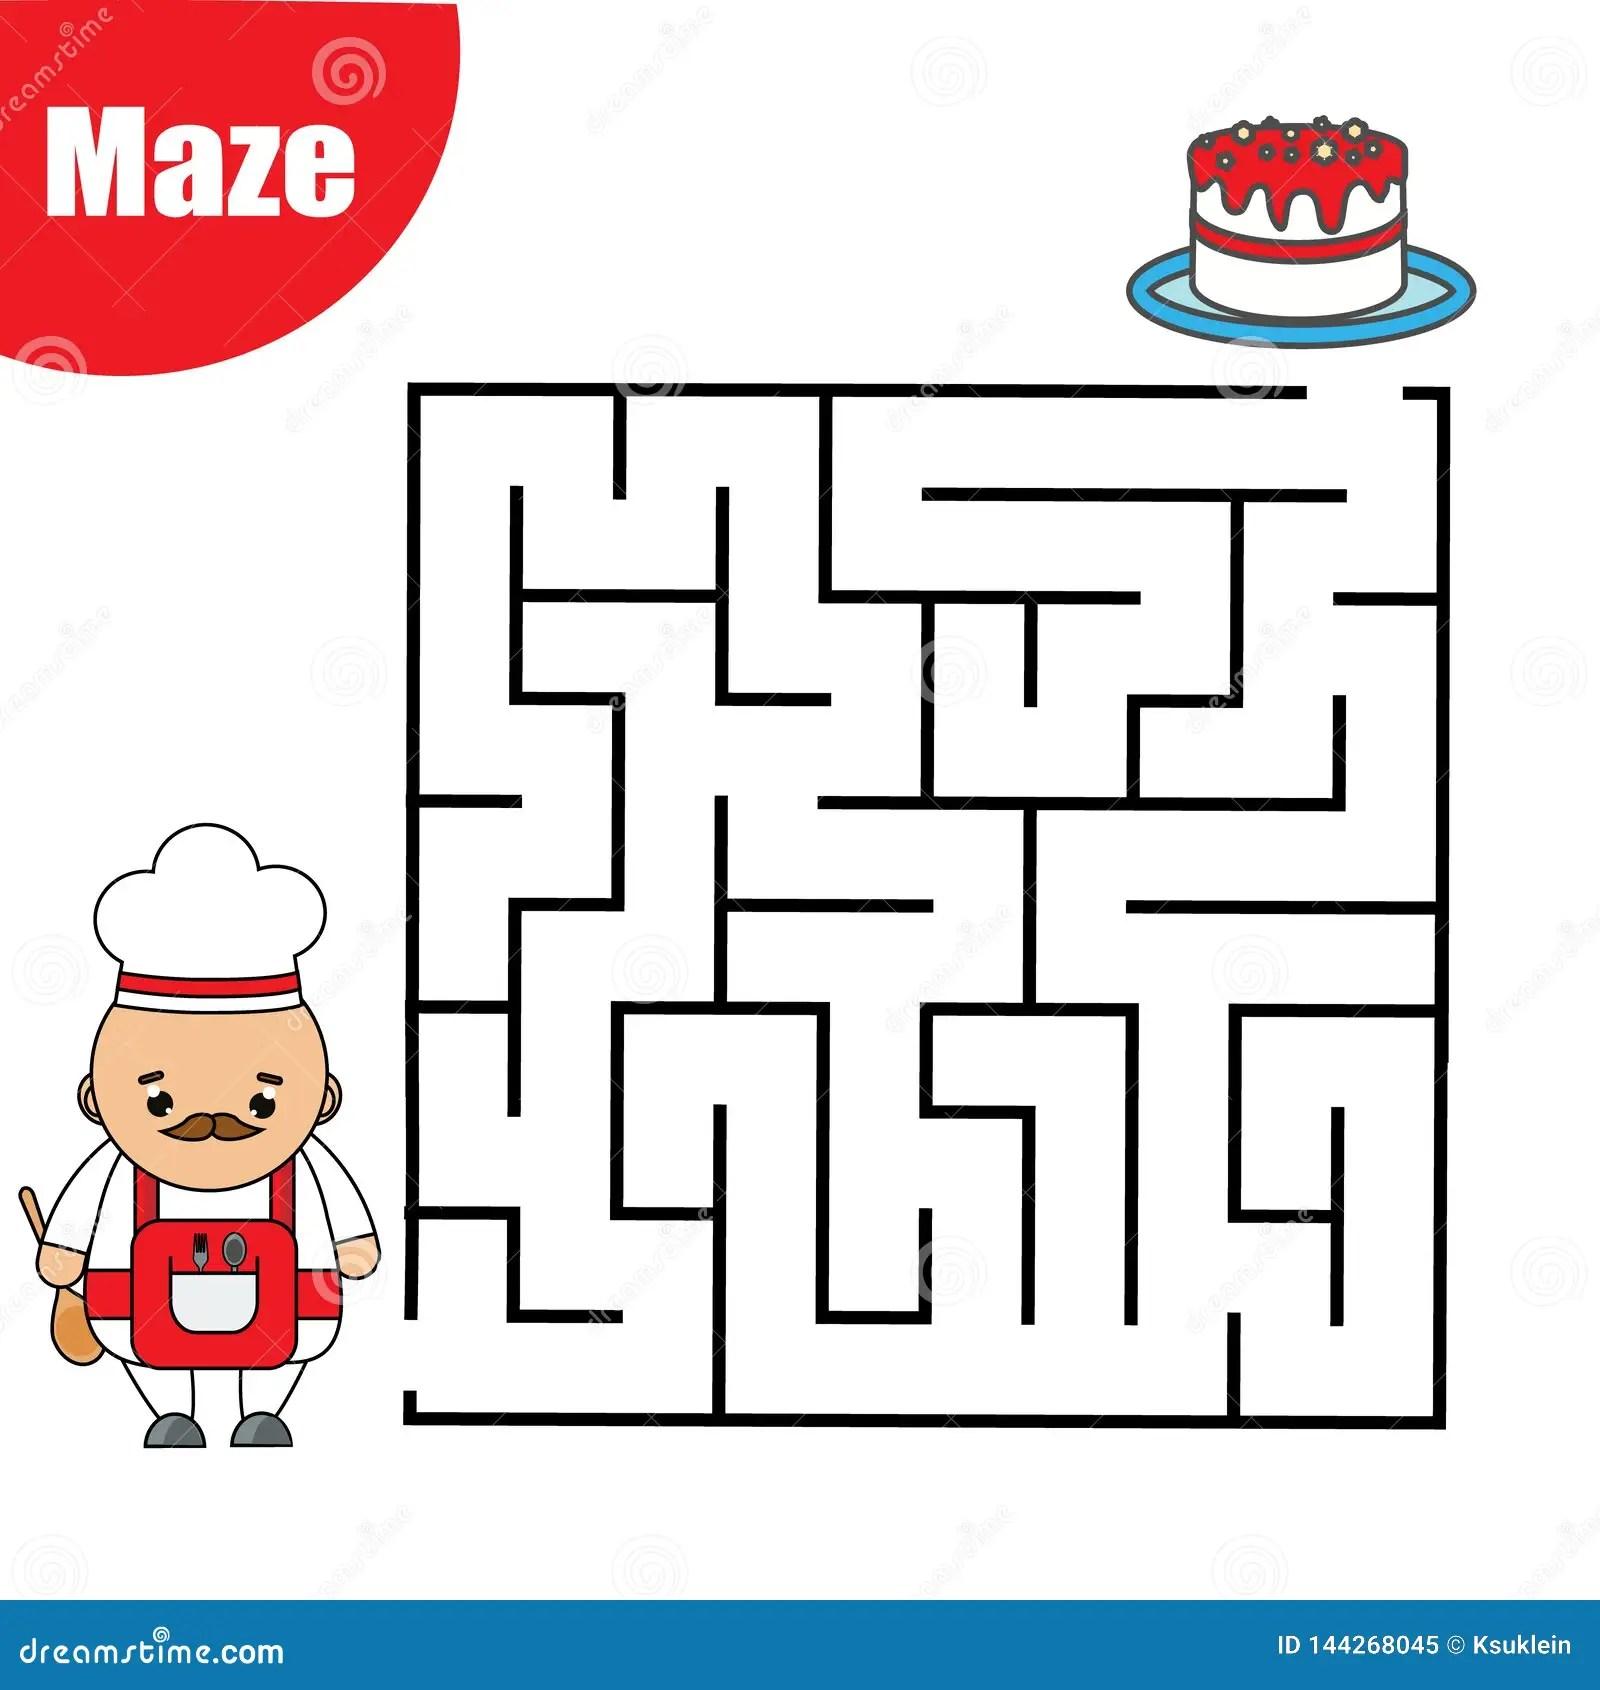 Maze Game For Children Help Cook Go Through Labyrinth